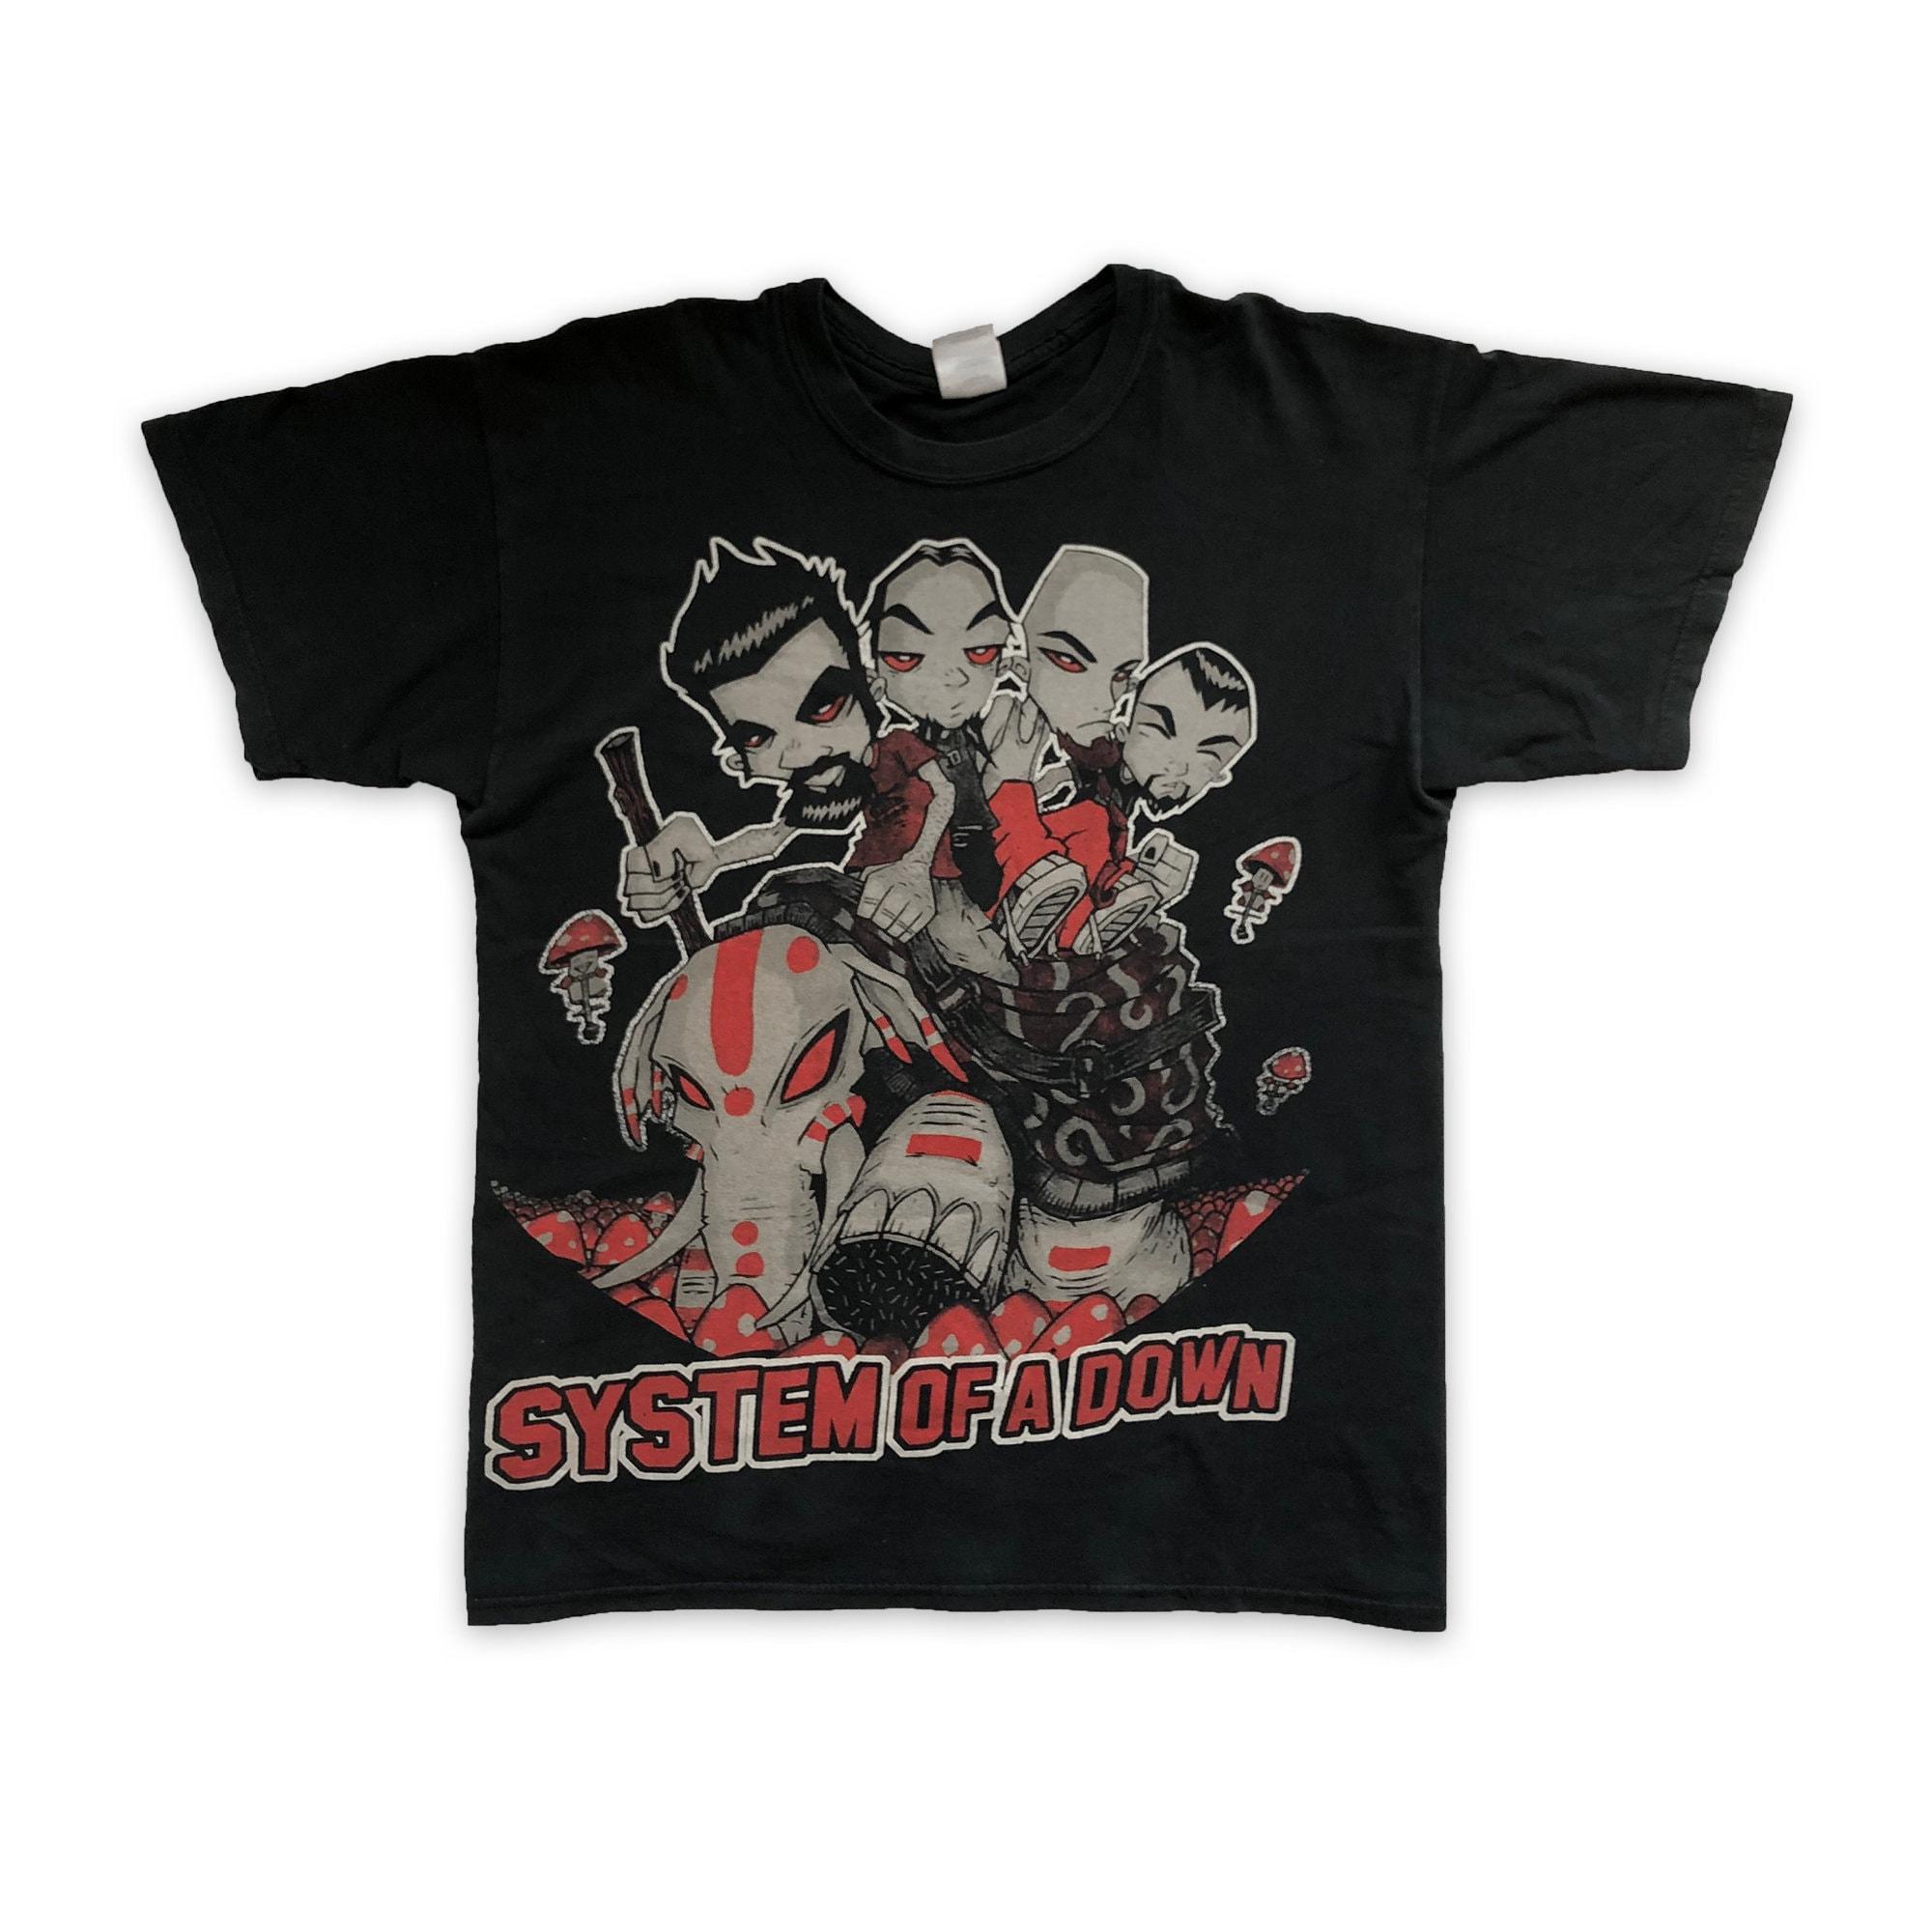 Vintage SLIPKNOT People t-Shirt Gildan reprint